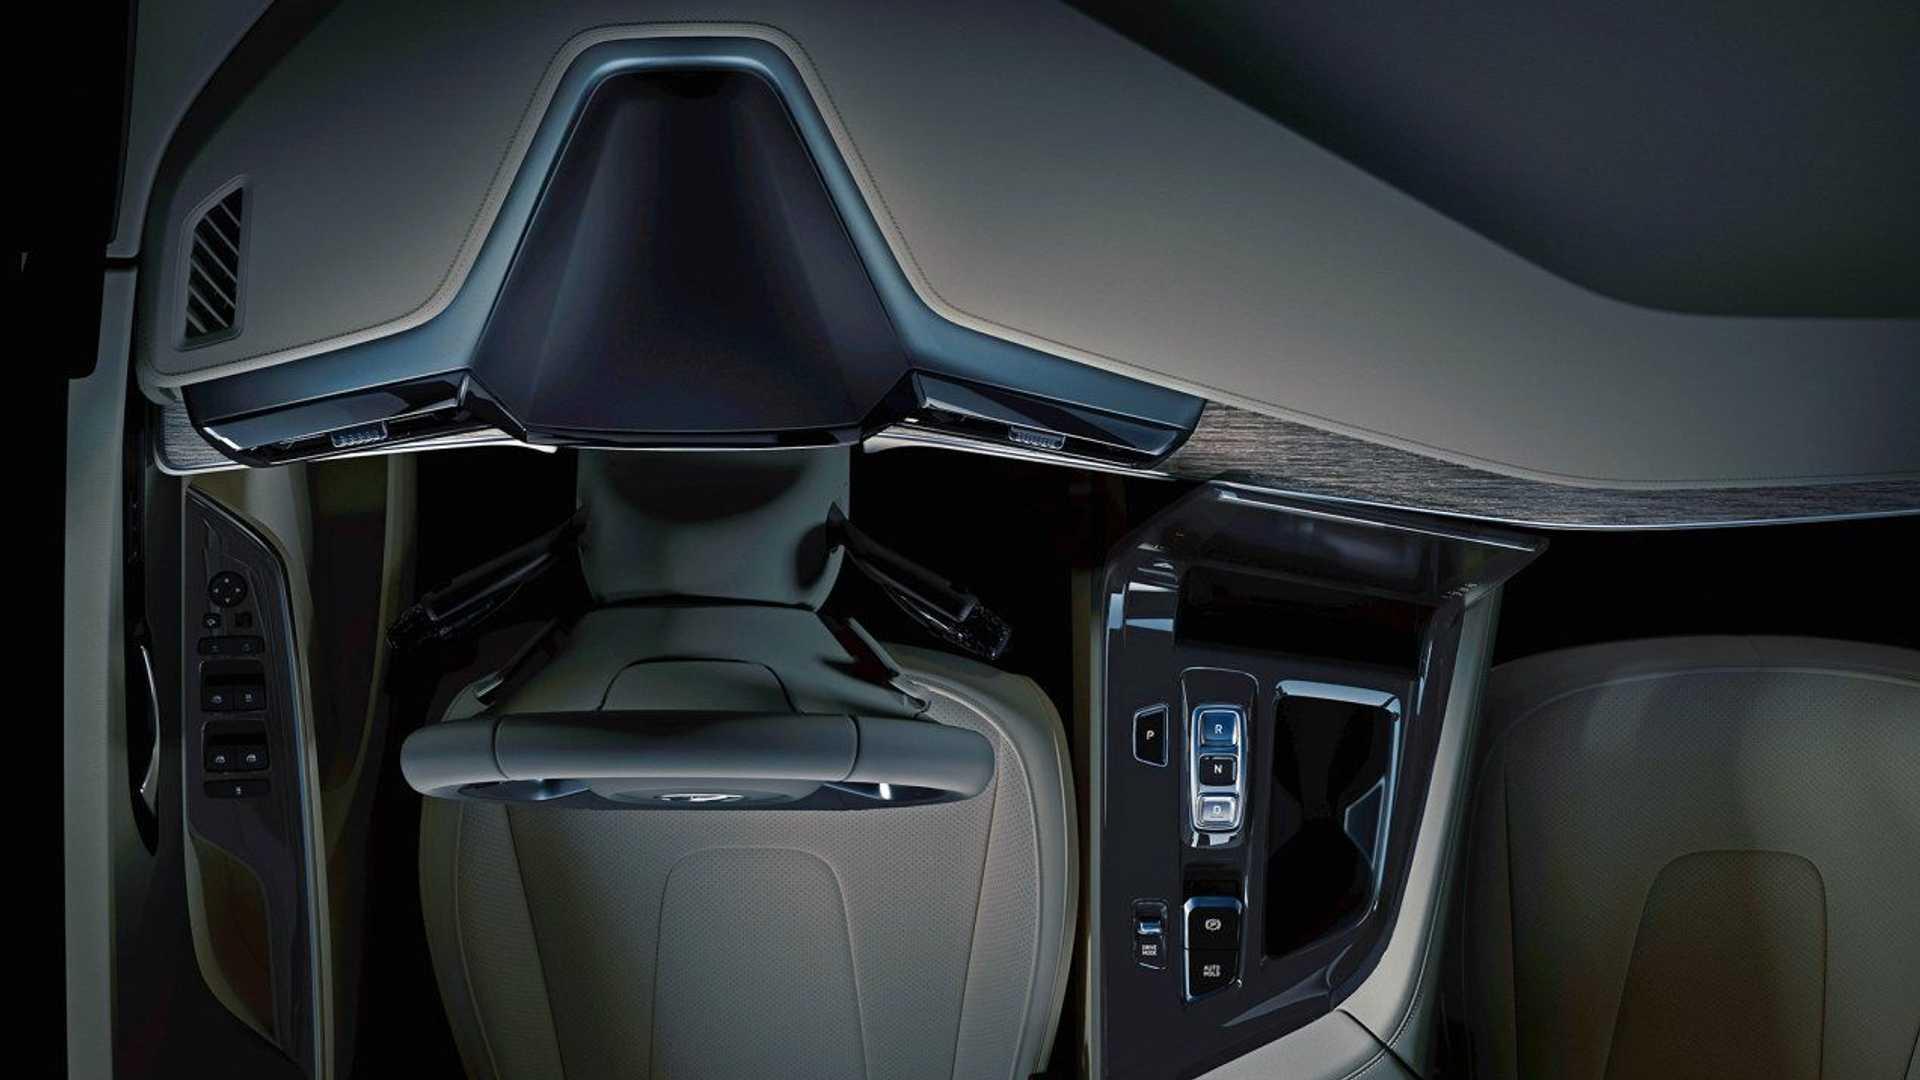 Hyundai-Custo-photos-7